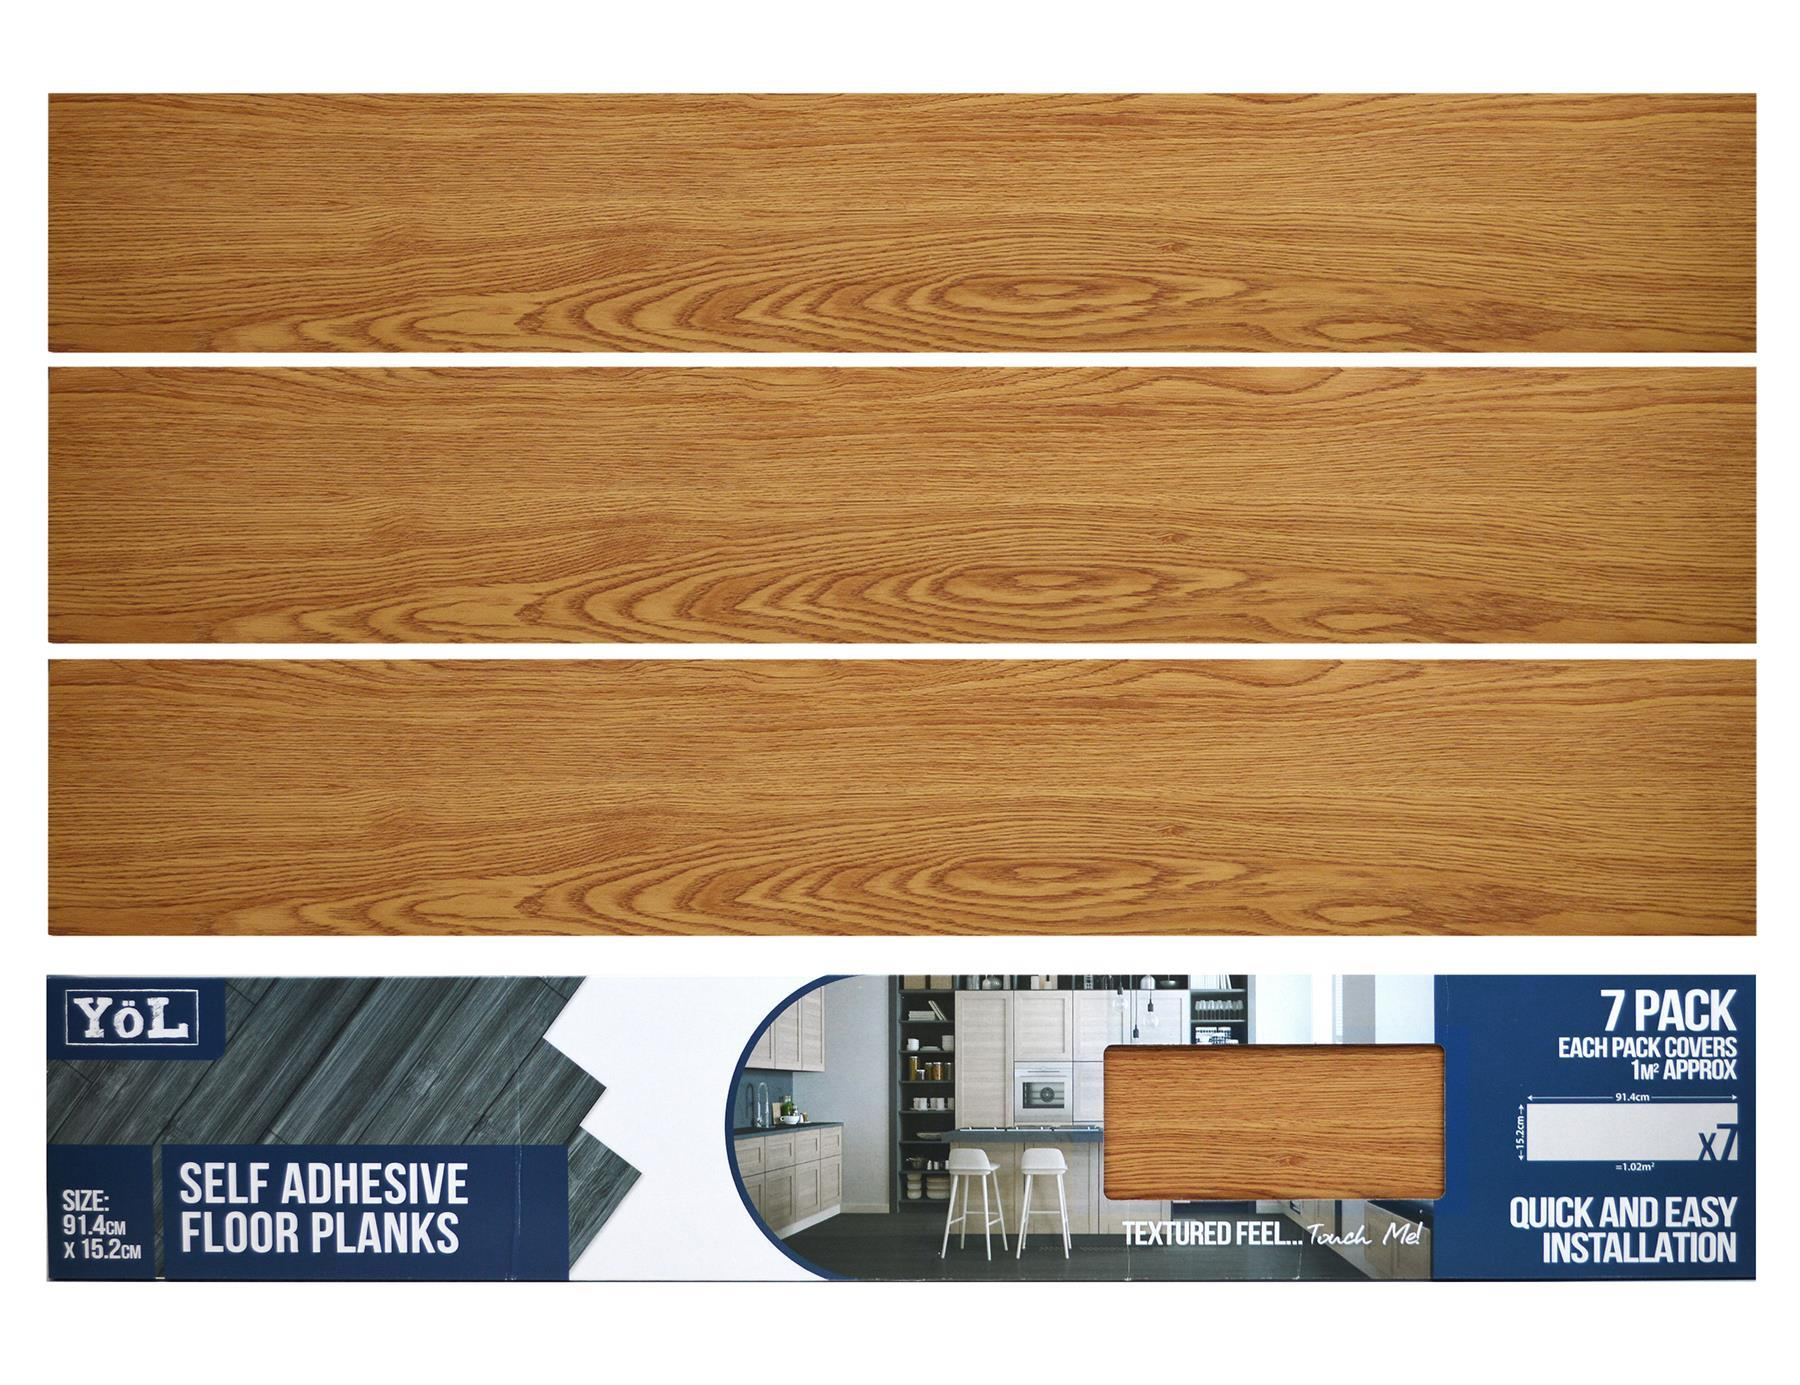 thumbnail 2 - Floor Planks Tiles Self Adhesive Vinyl Brown Wood Flooring Kitchen Bathroom